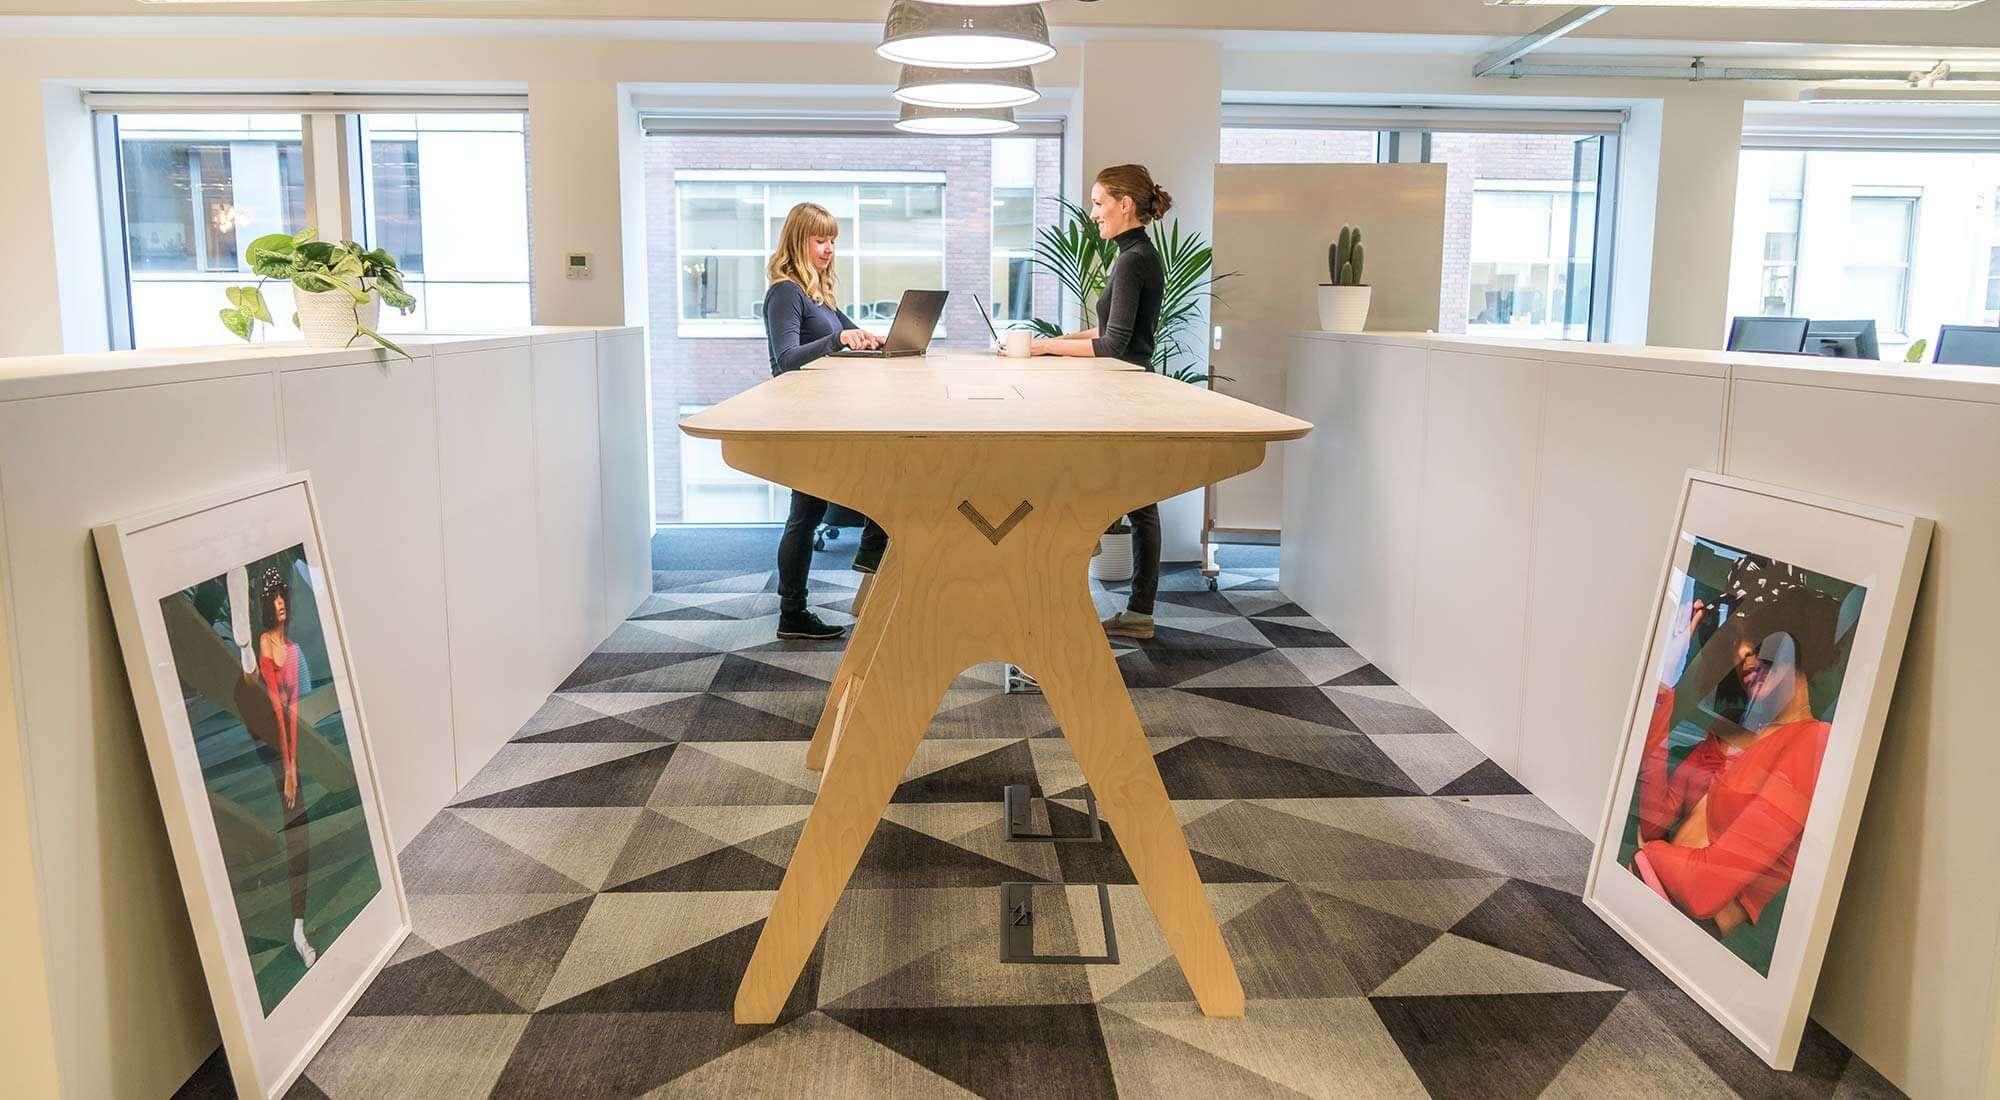 Milliken Carpet Feature Plywood Office Fitout.jpg